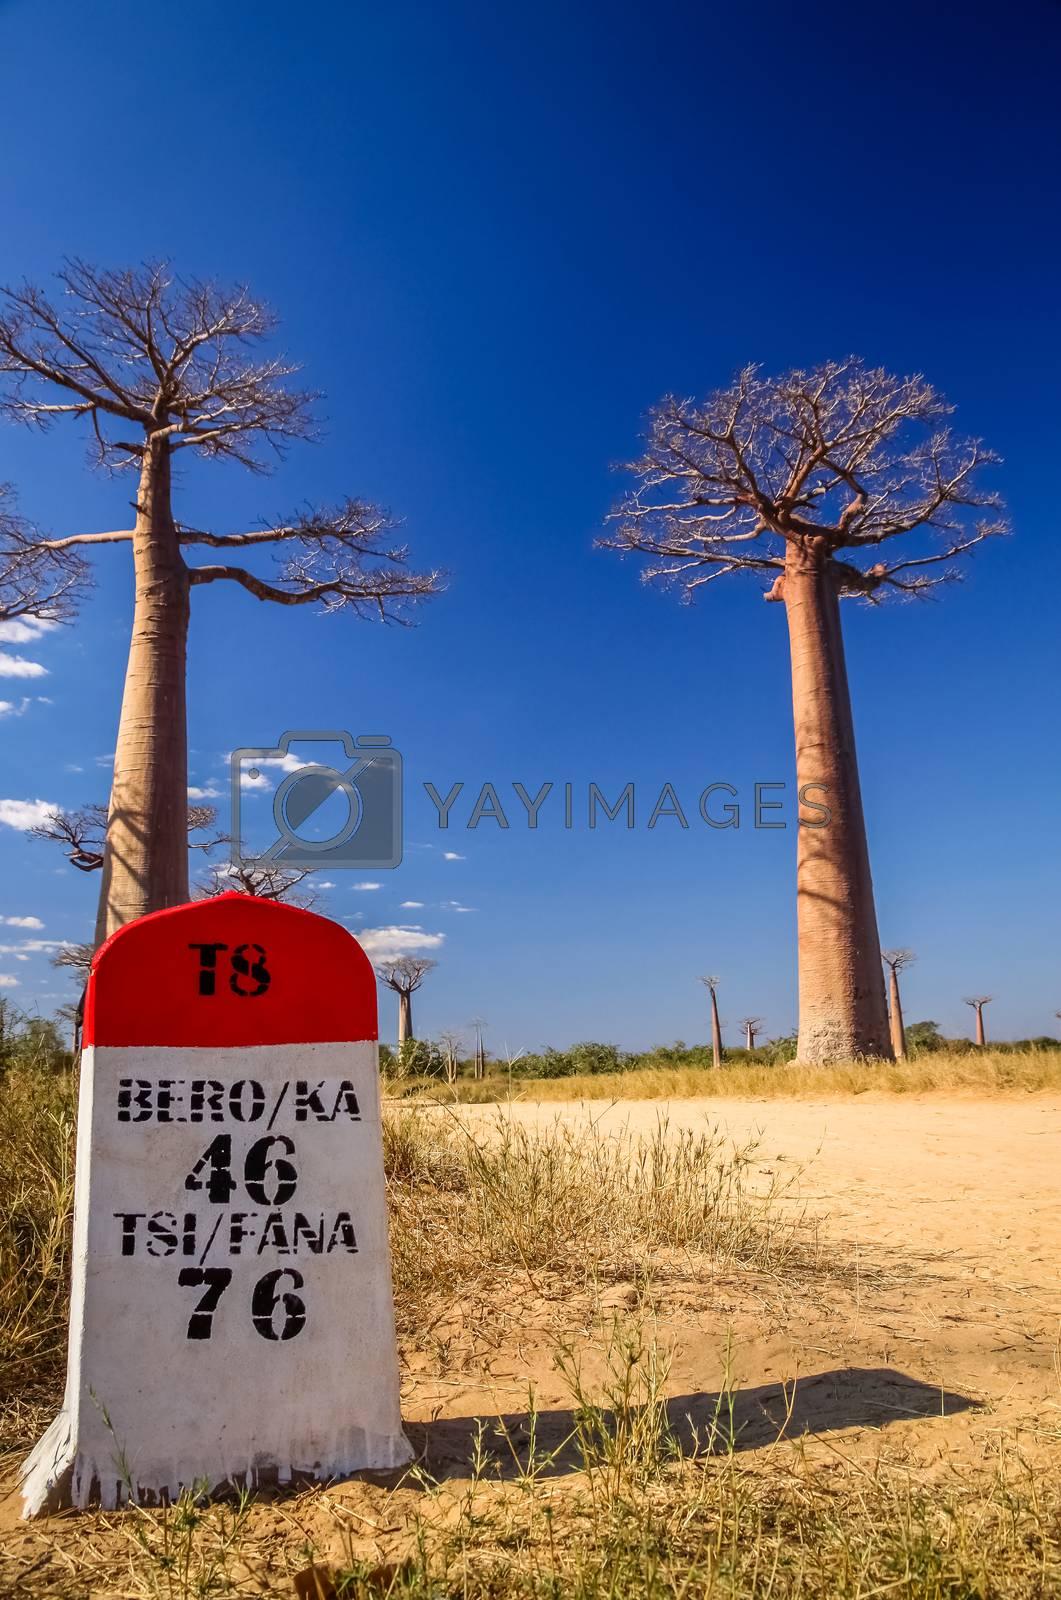 Royalty free image of Baobab road by pawopa3336